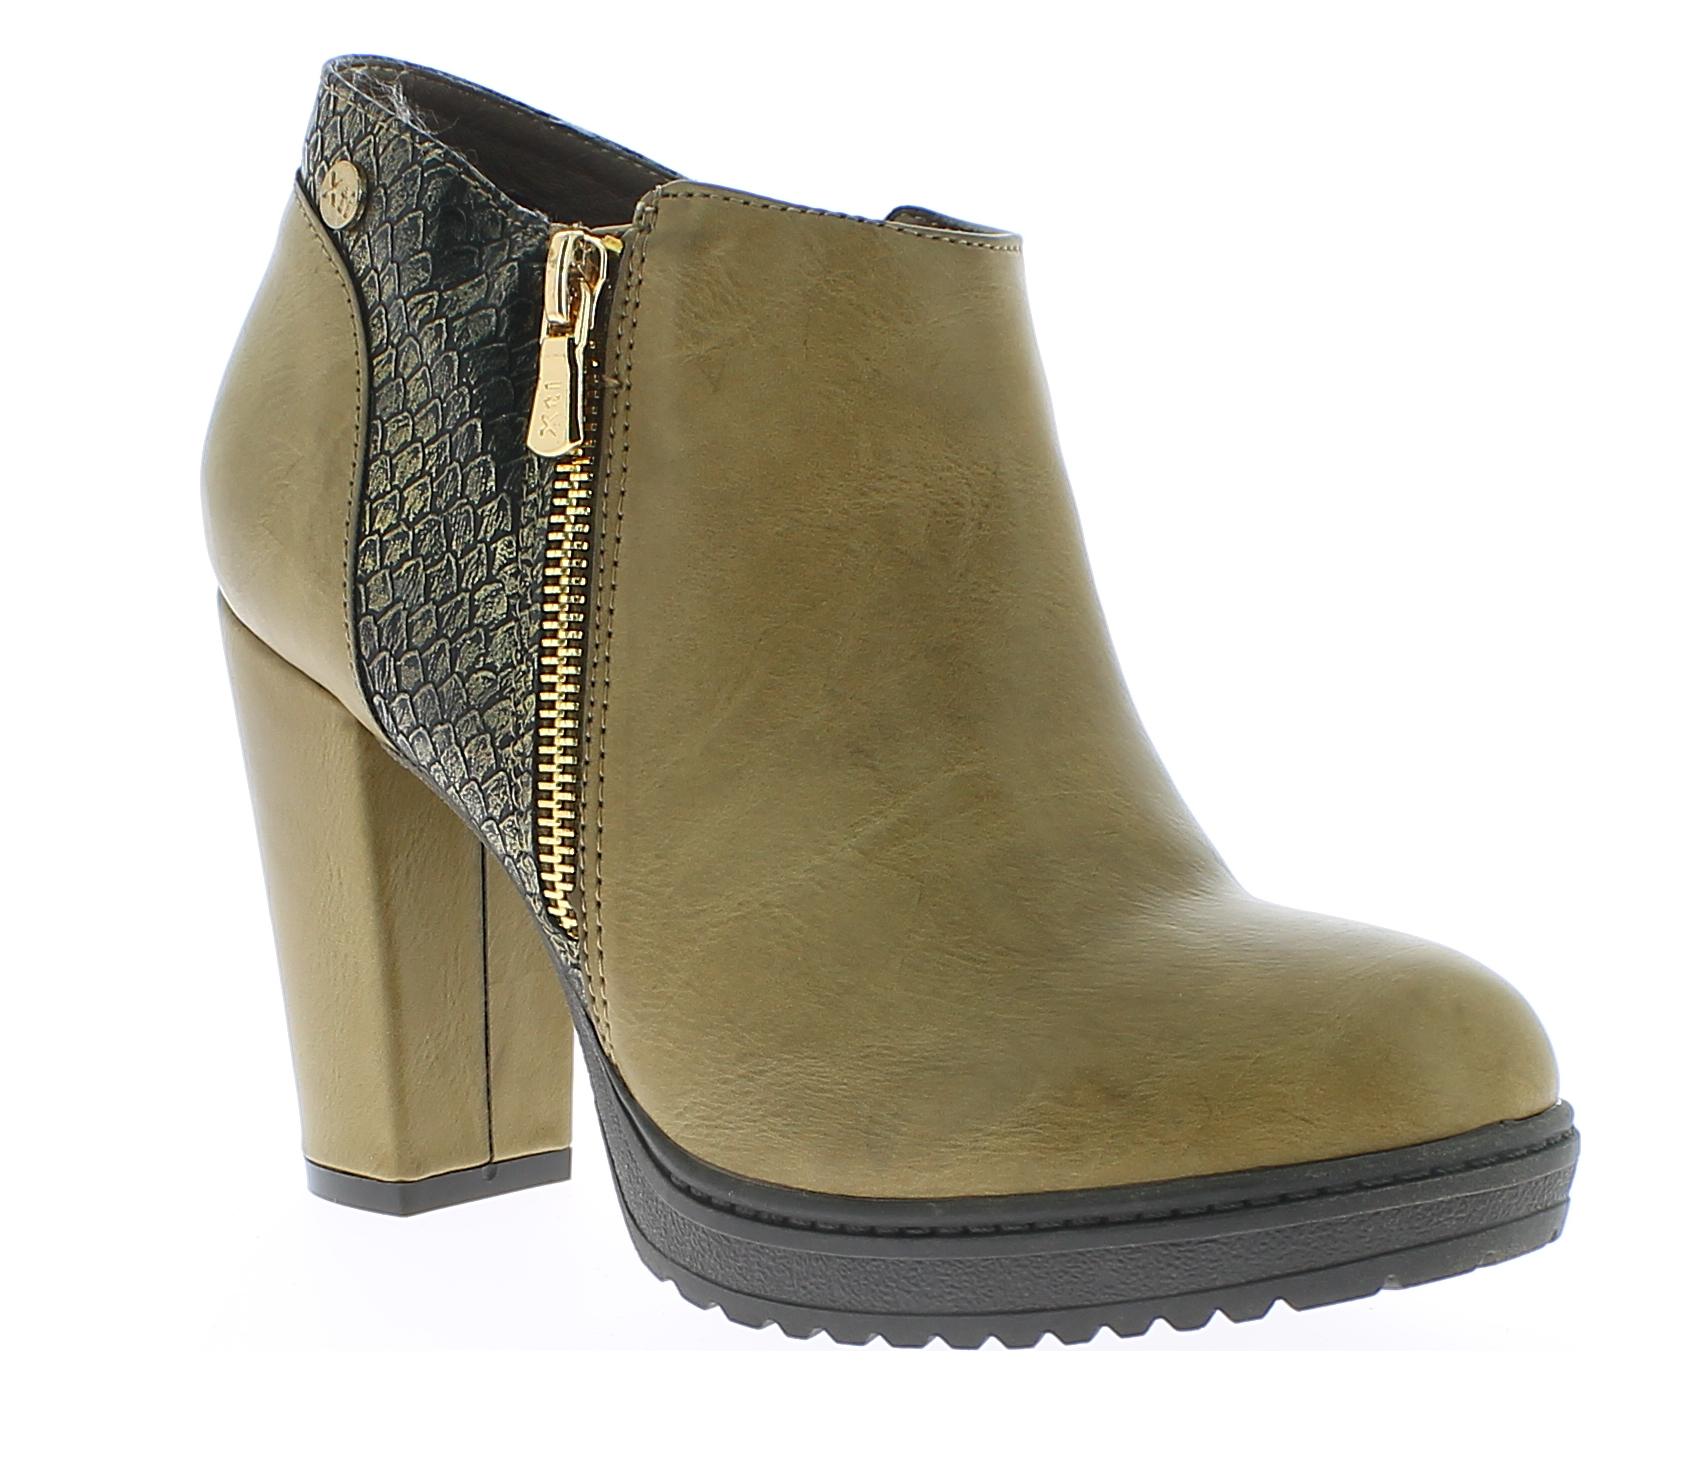 XTI Γυναικείο Μποτάκι 46030 Καφέ - IqShoes - 46030 TAUPE-brown-36/1/24/7 παπούτσια  γυναικεία μποτάκια